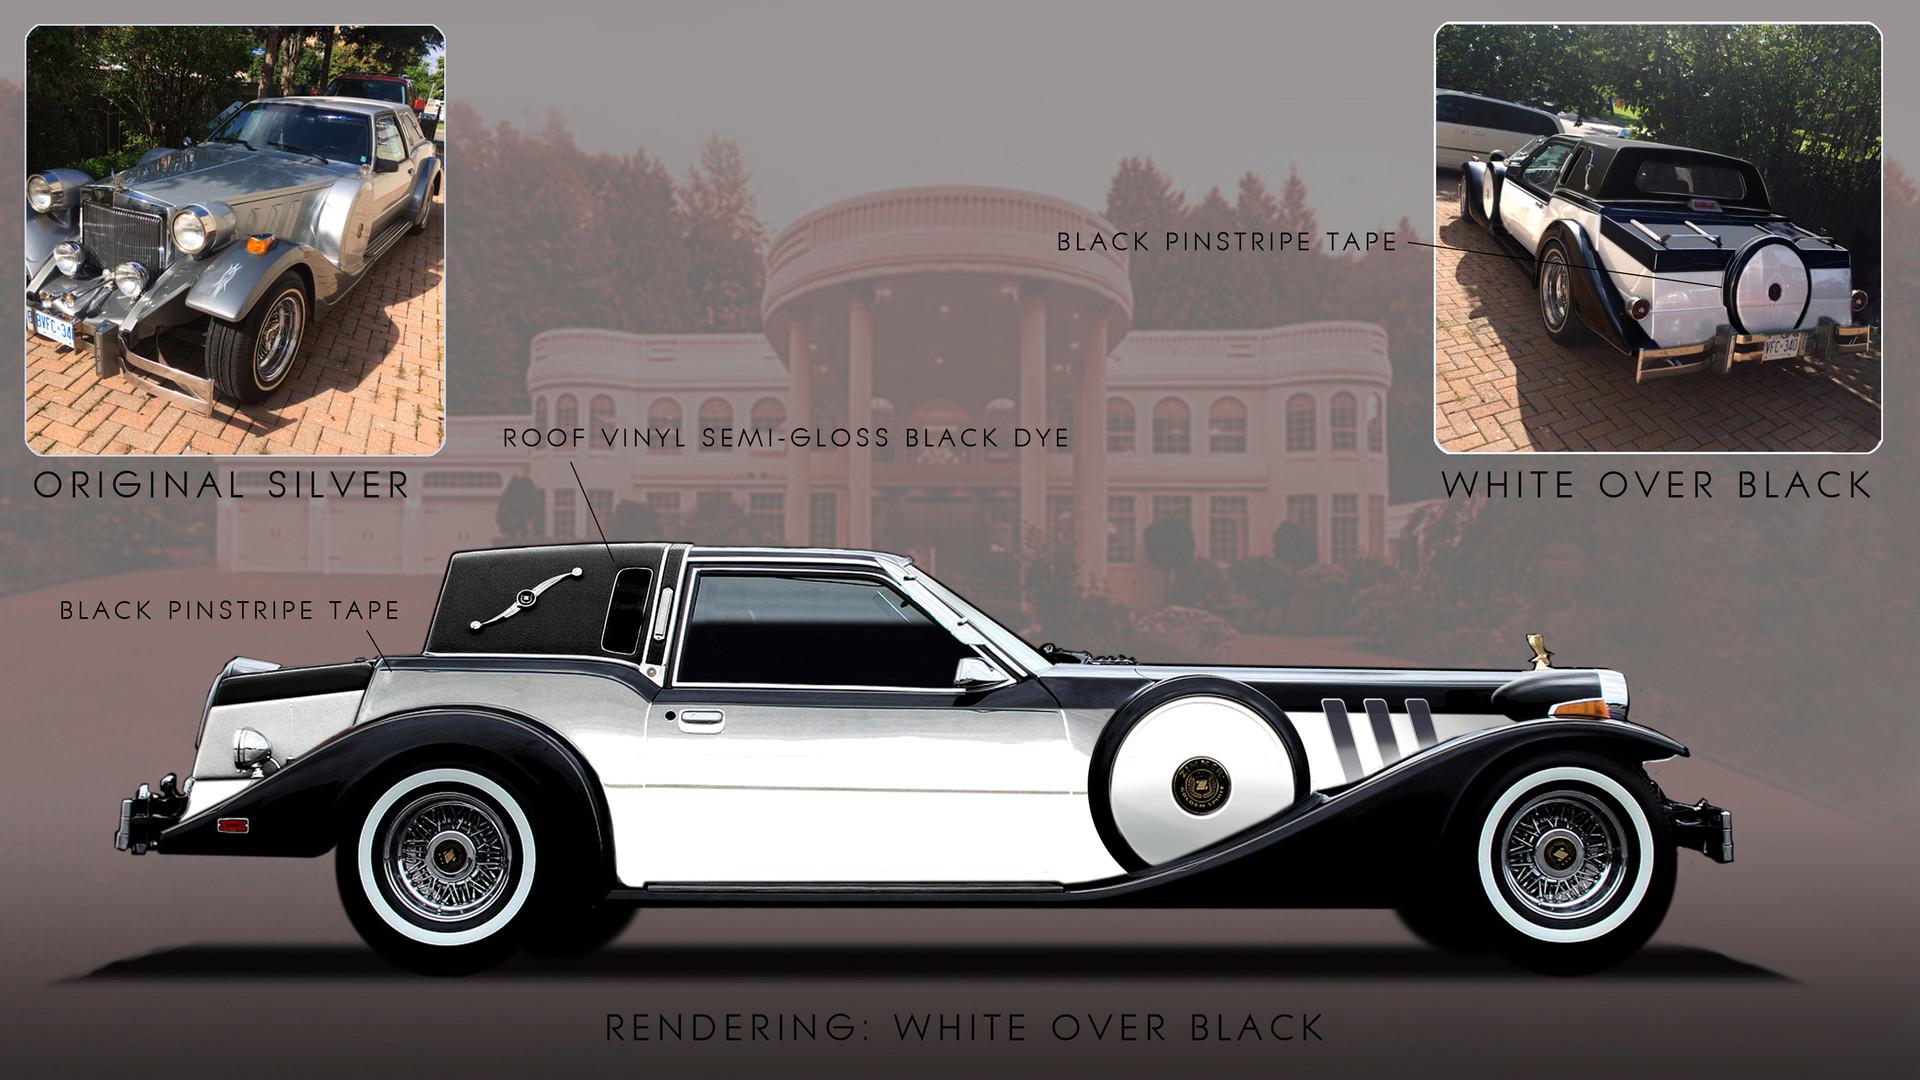 Cruella's Car Concept - Once Upon a Time Season 4